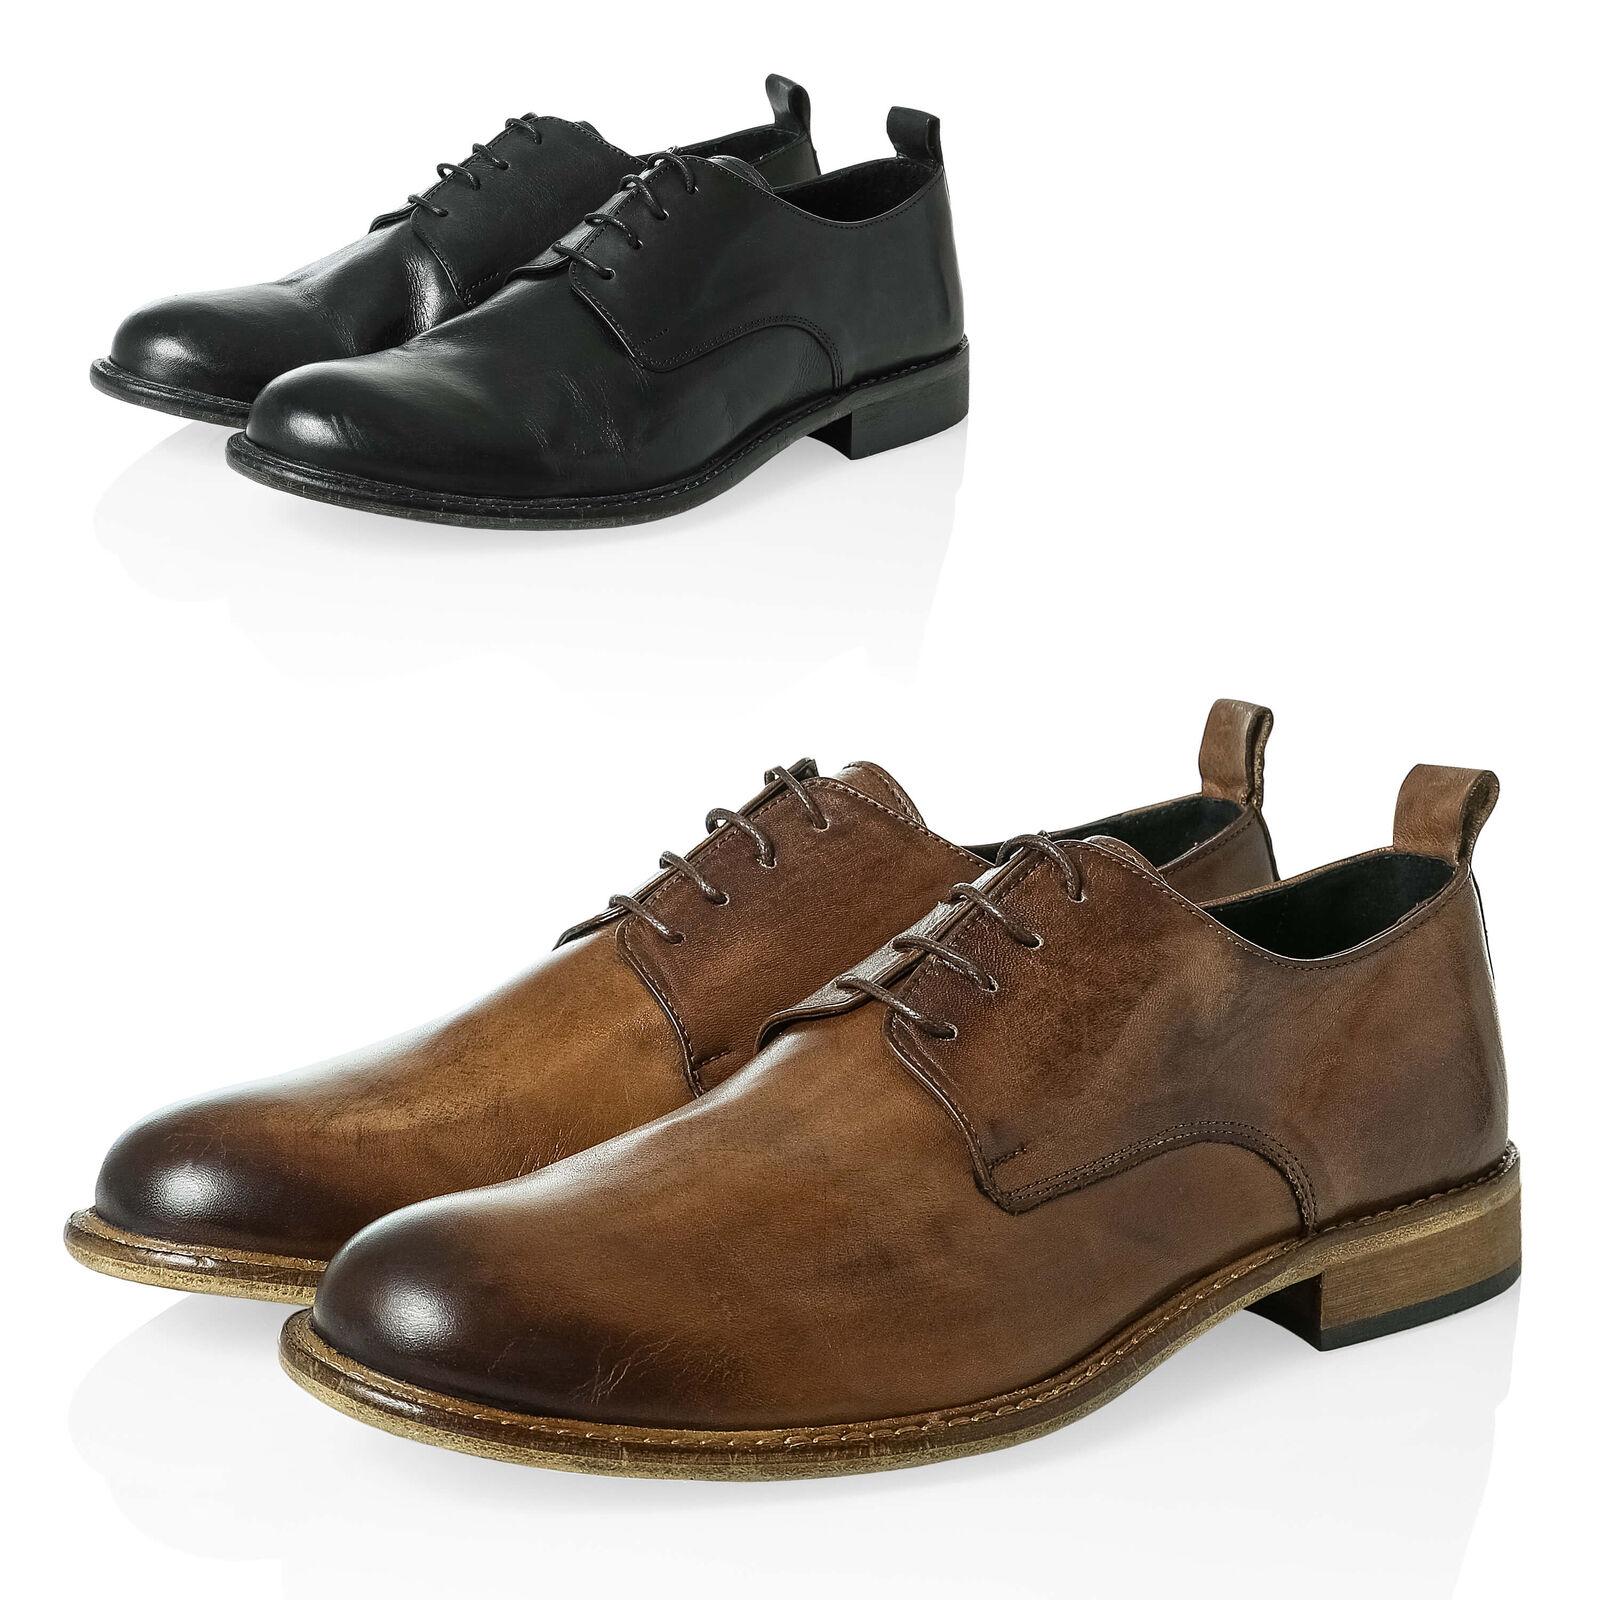 NEU Antony Morato Herren Schnürer Schuhe Schnürschuhe Schnürer Herren Geschäft ... 0d71de